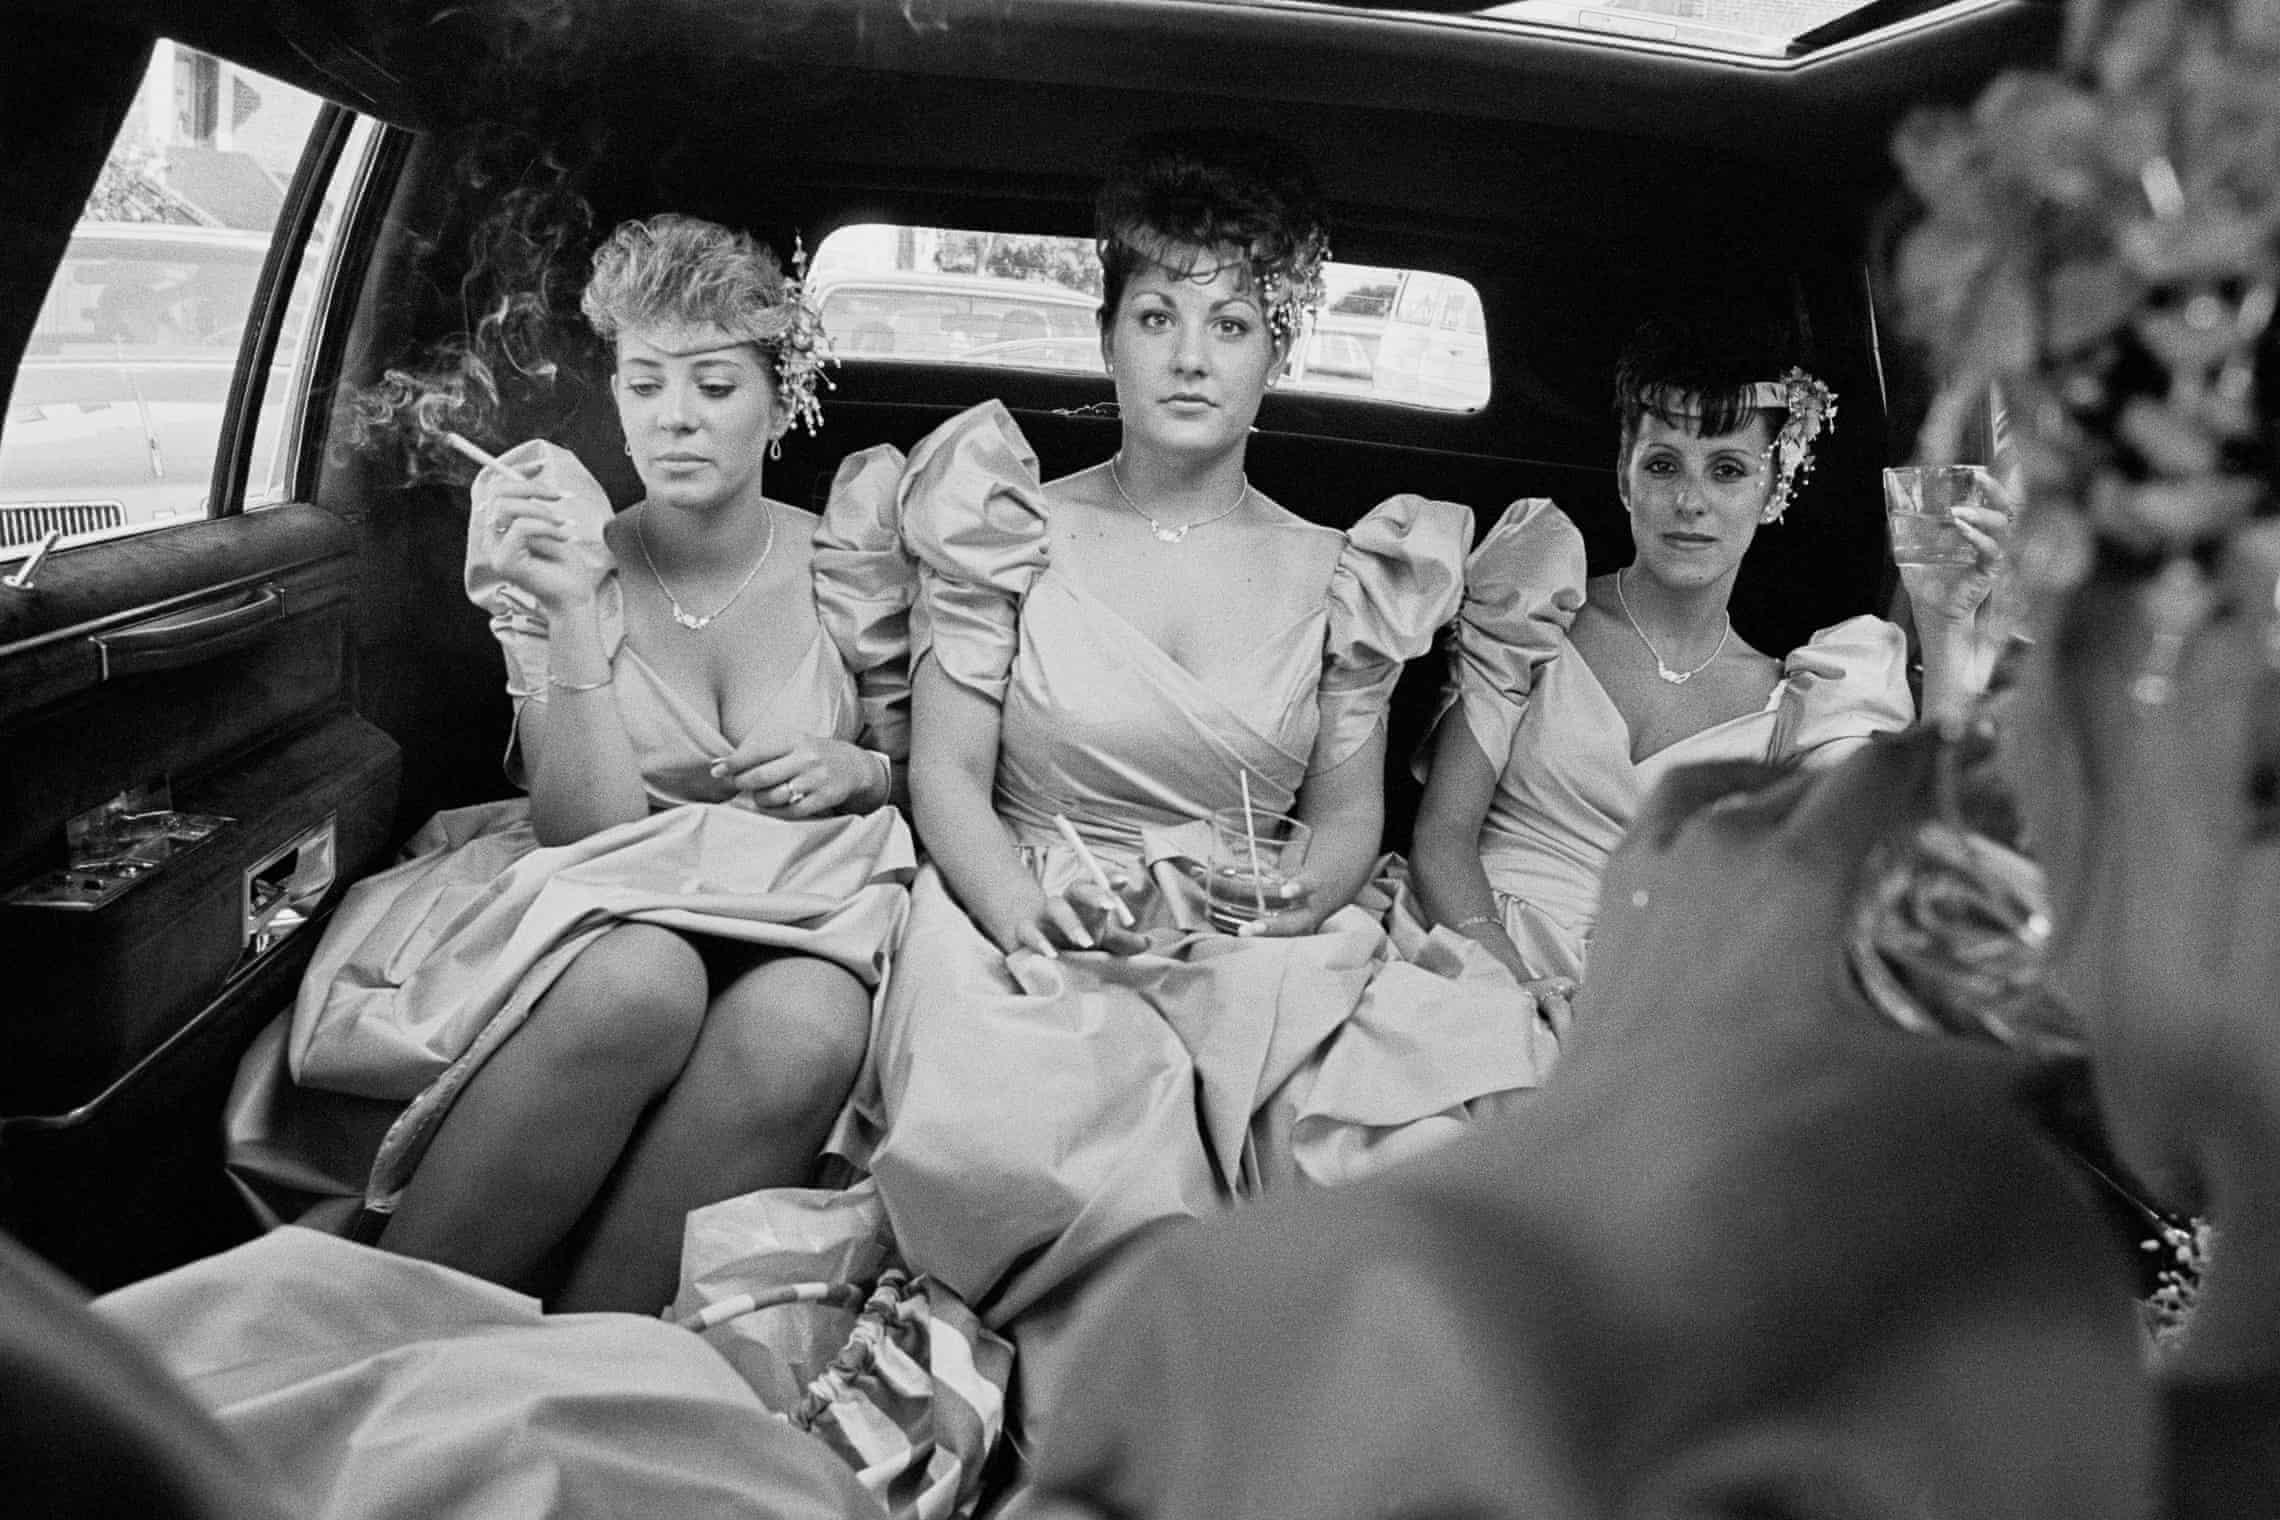 Kathy Shorr Bridesmaids smoking in a limousine 1989